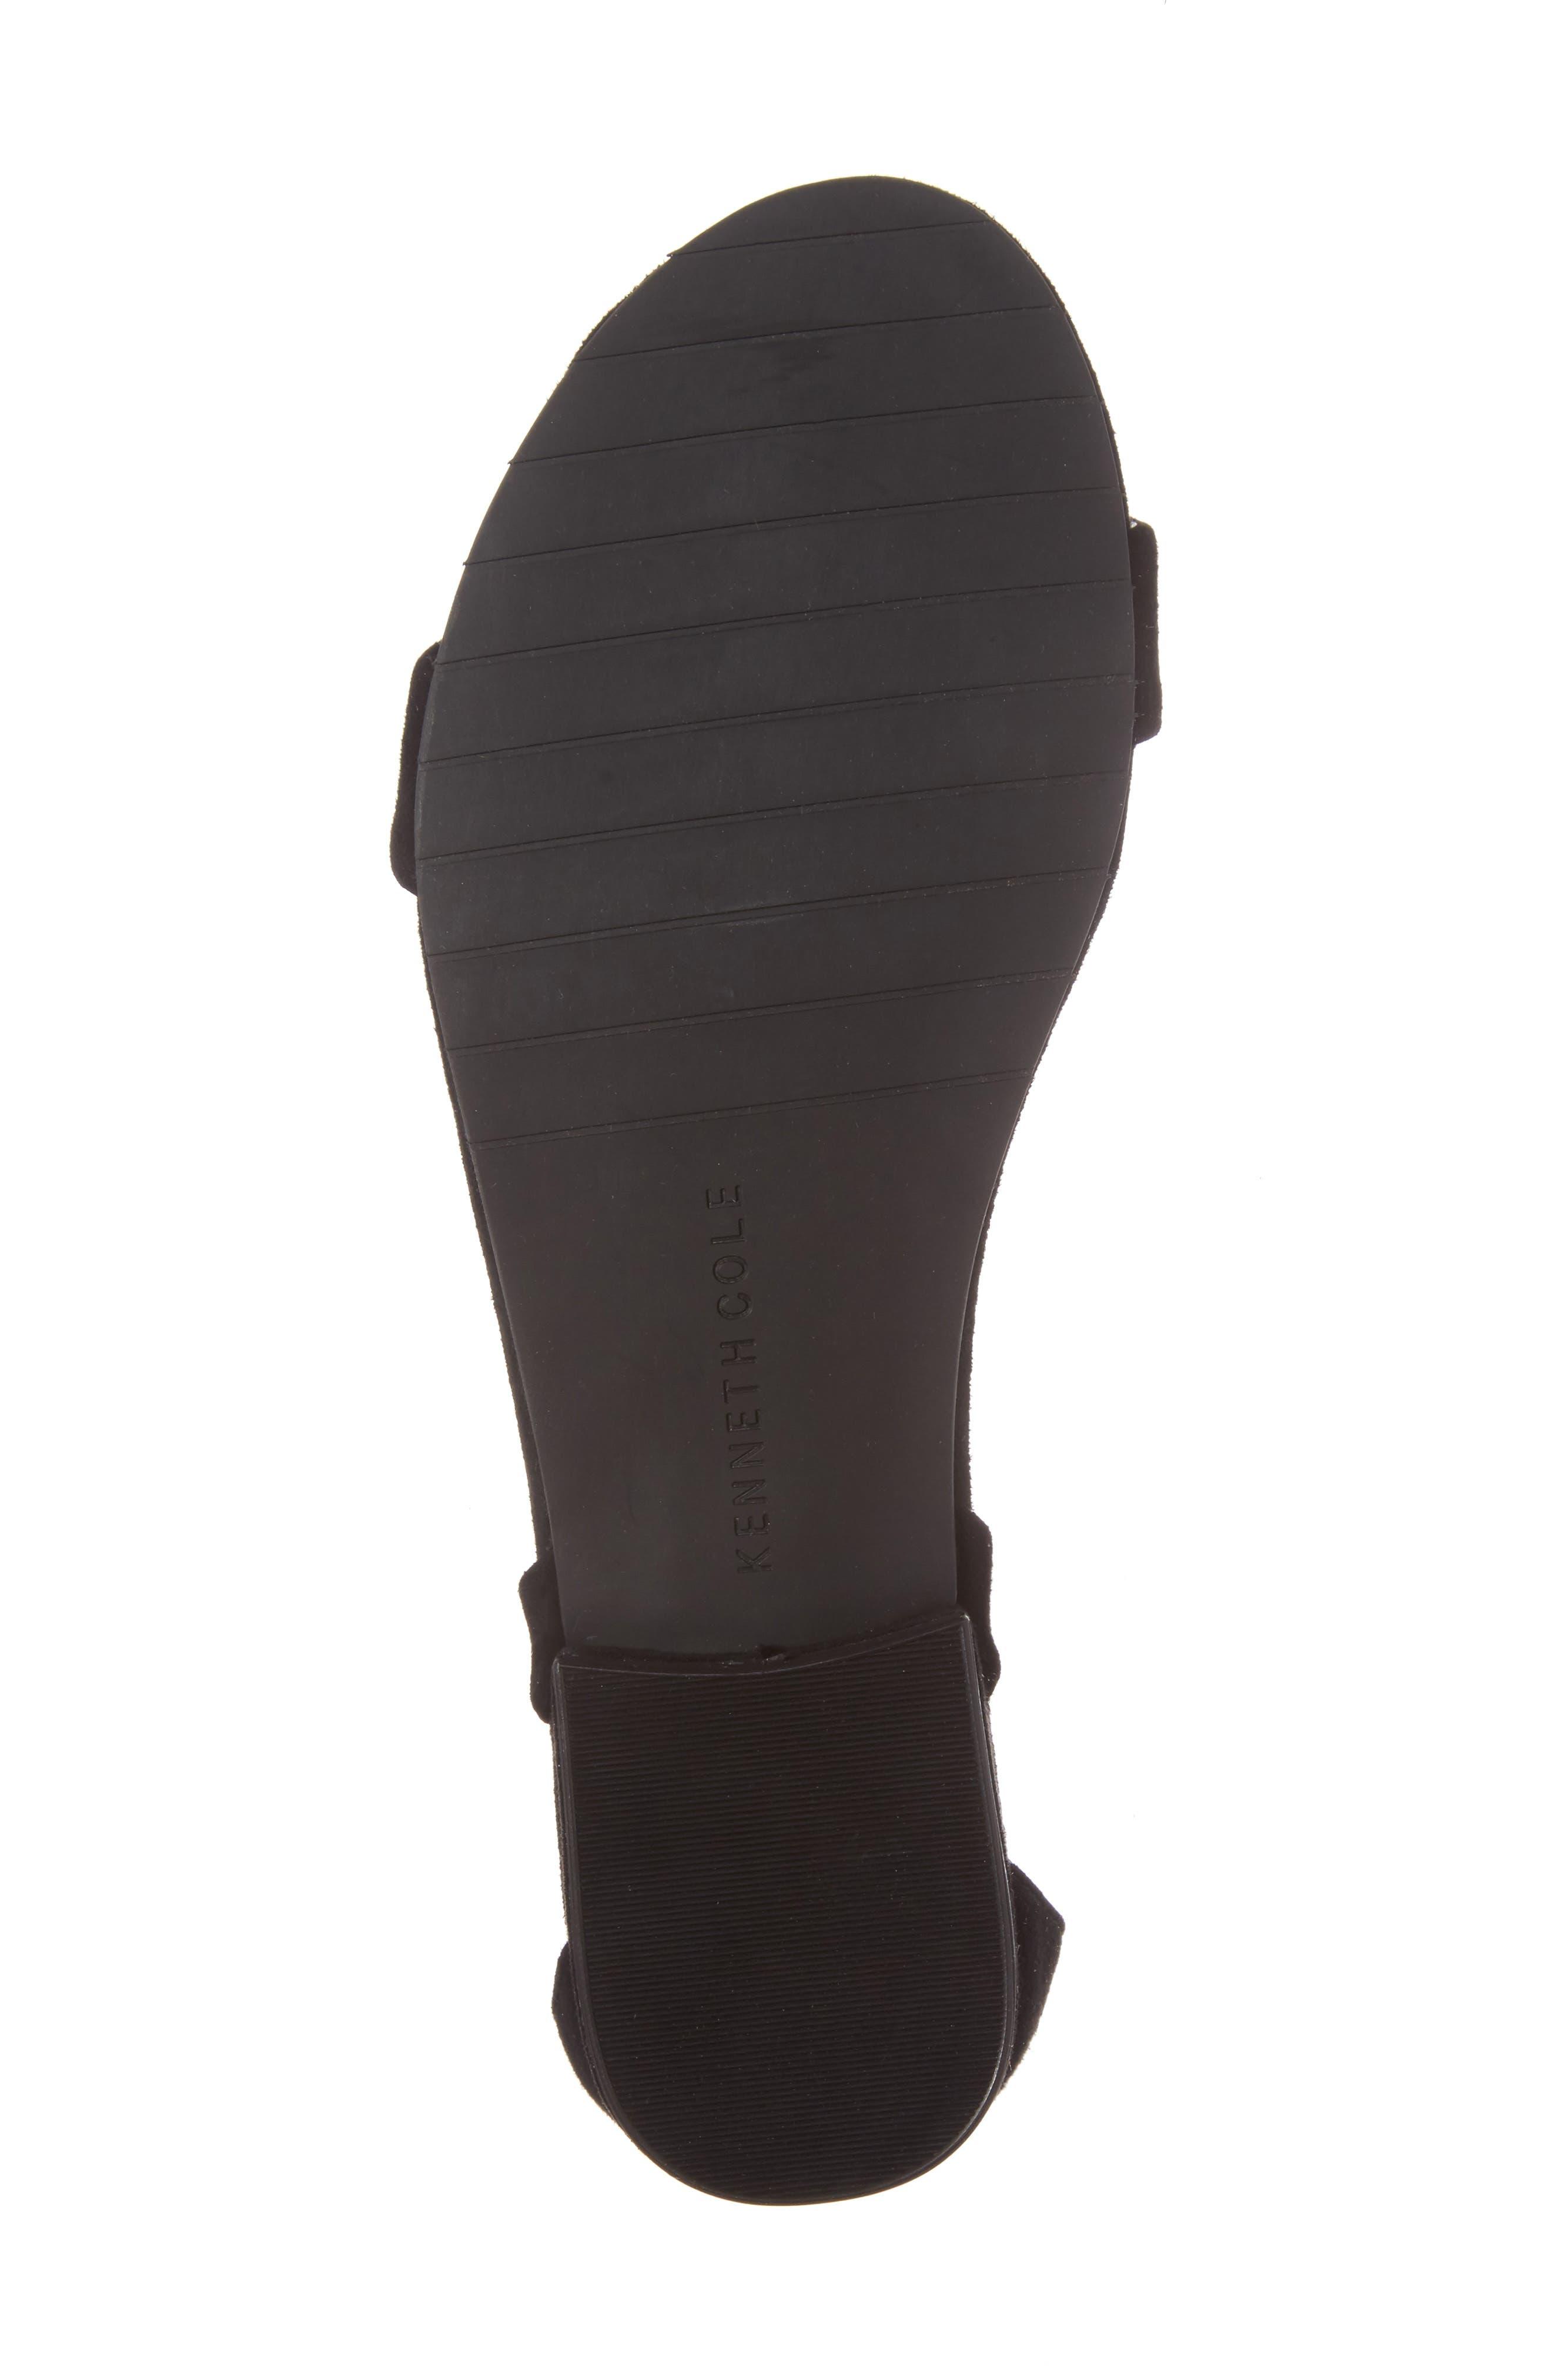 Valen Tassel Lace-Up Sandal,                             Alternate thumbnail 6, color,                             Black Suede